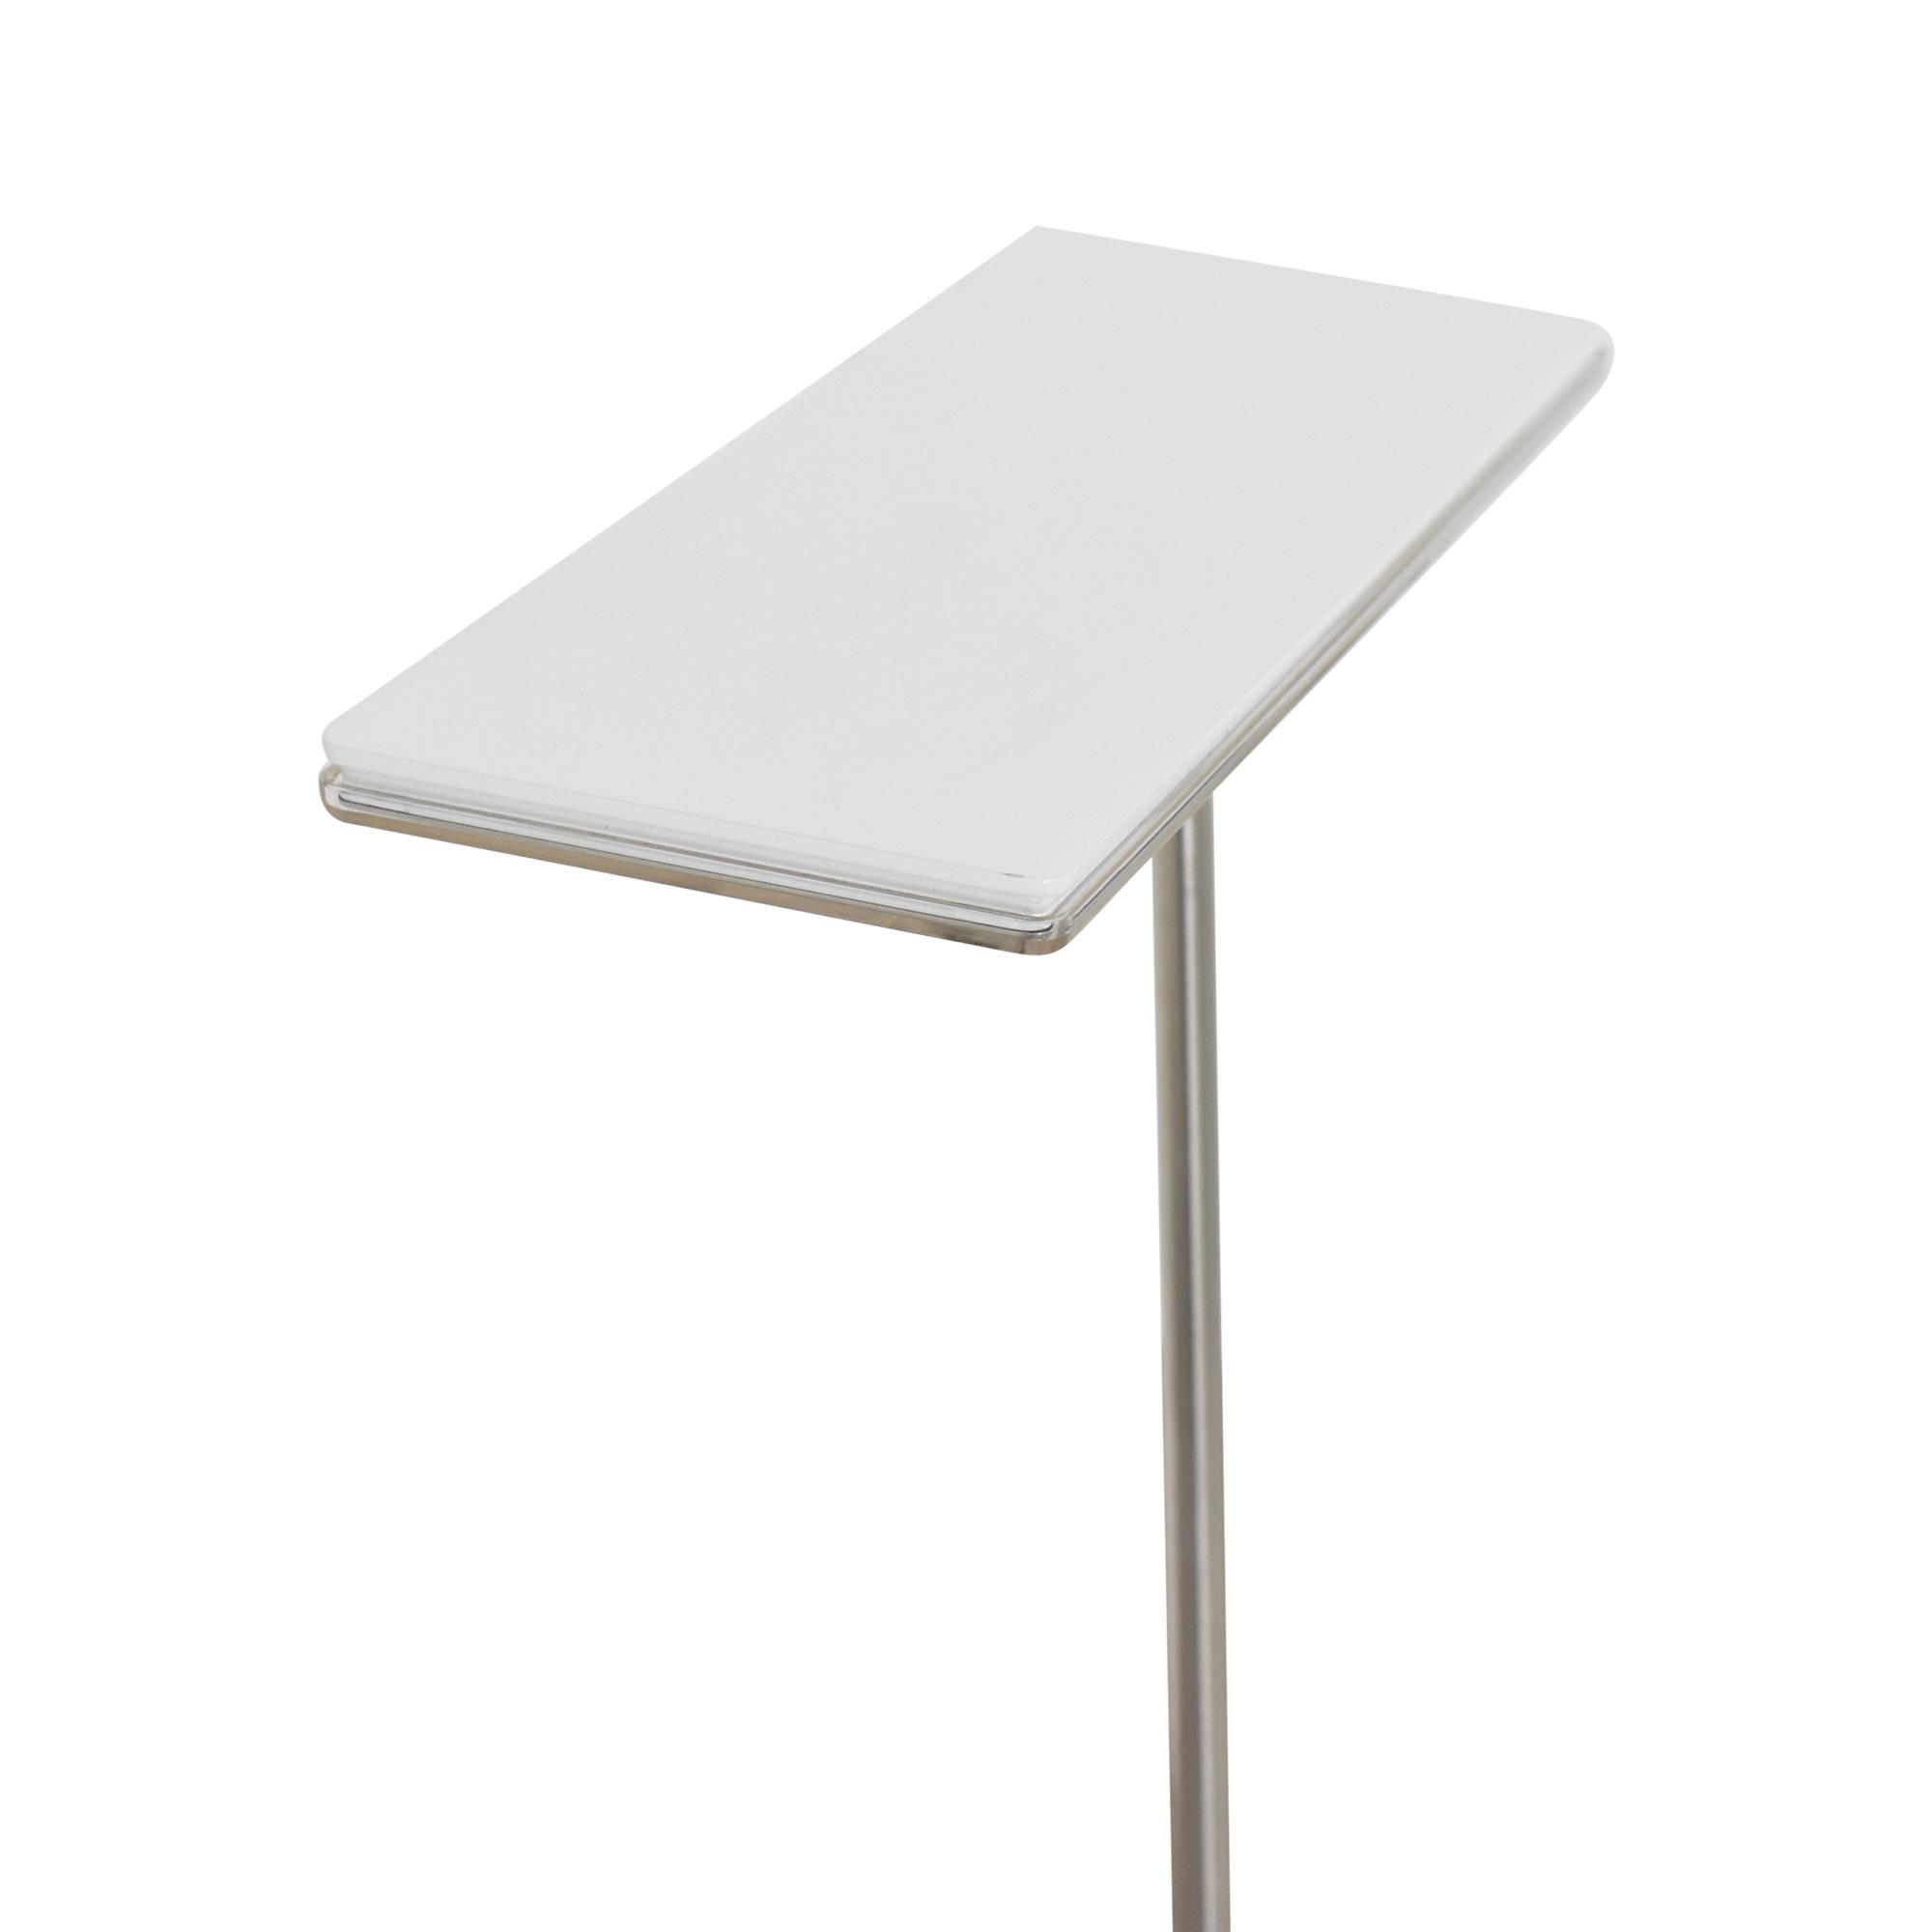 Room & Board Horizon LED Table Lamp Room & Board